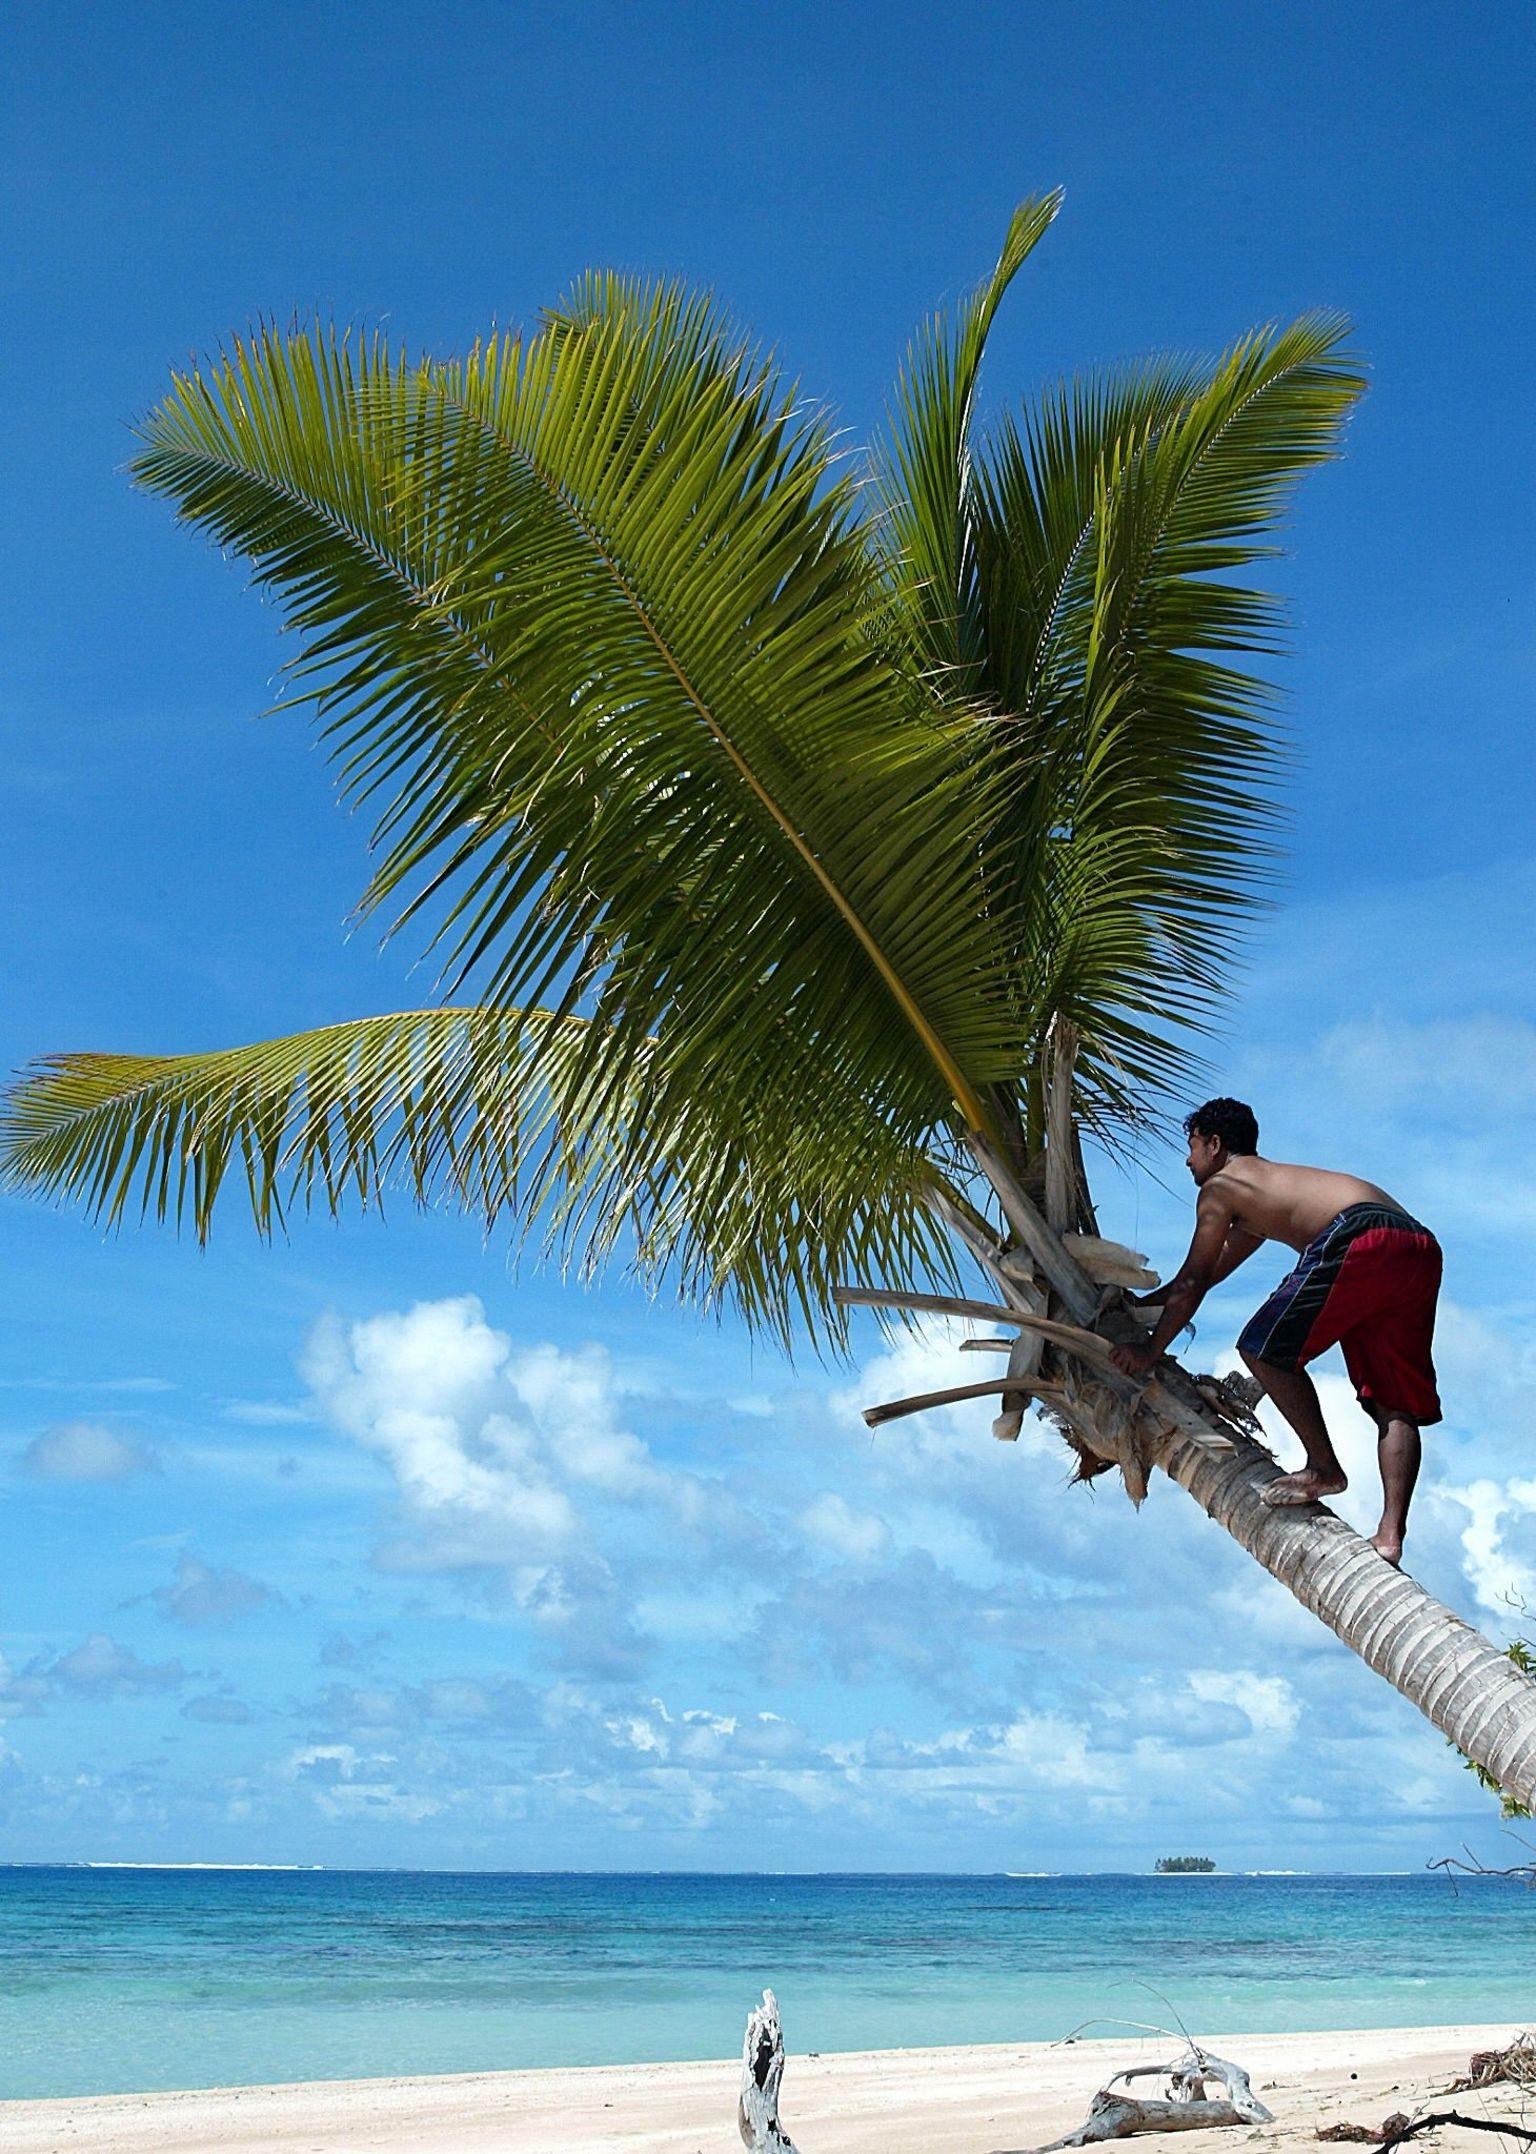 Man climbing palm tree in Tuvalu